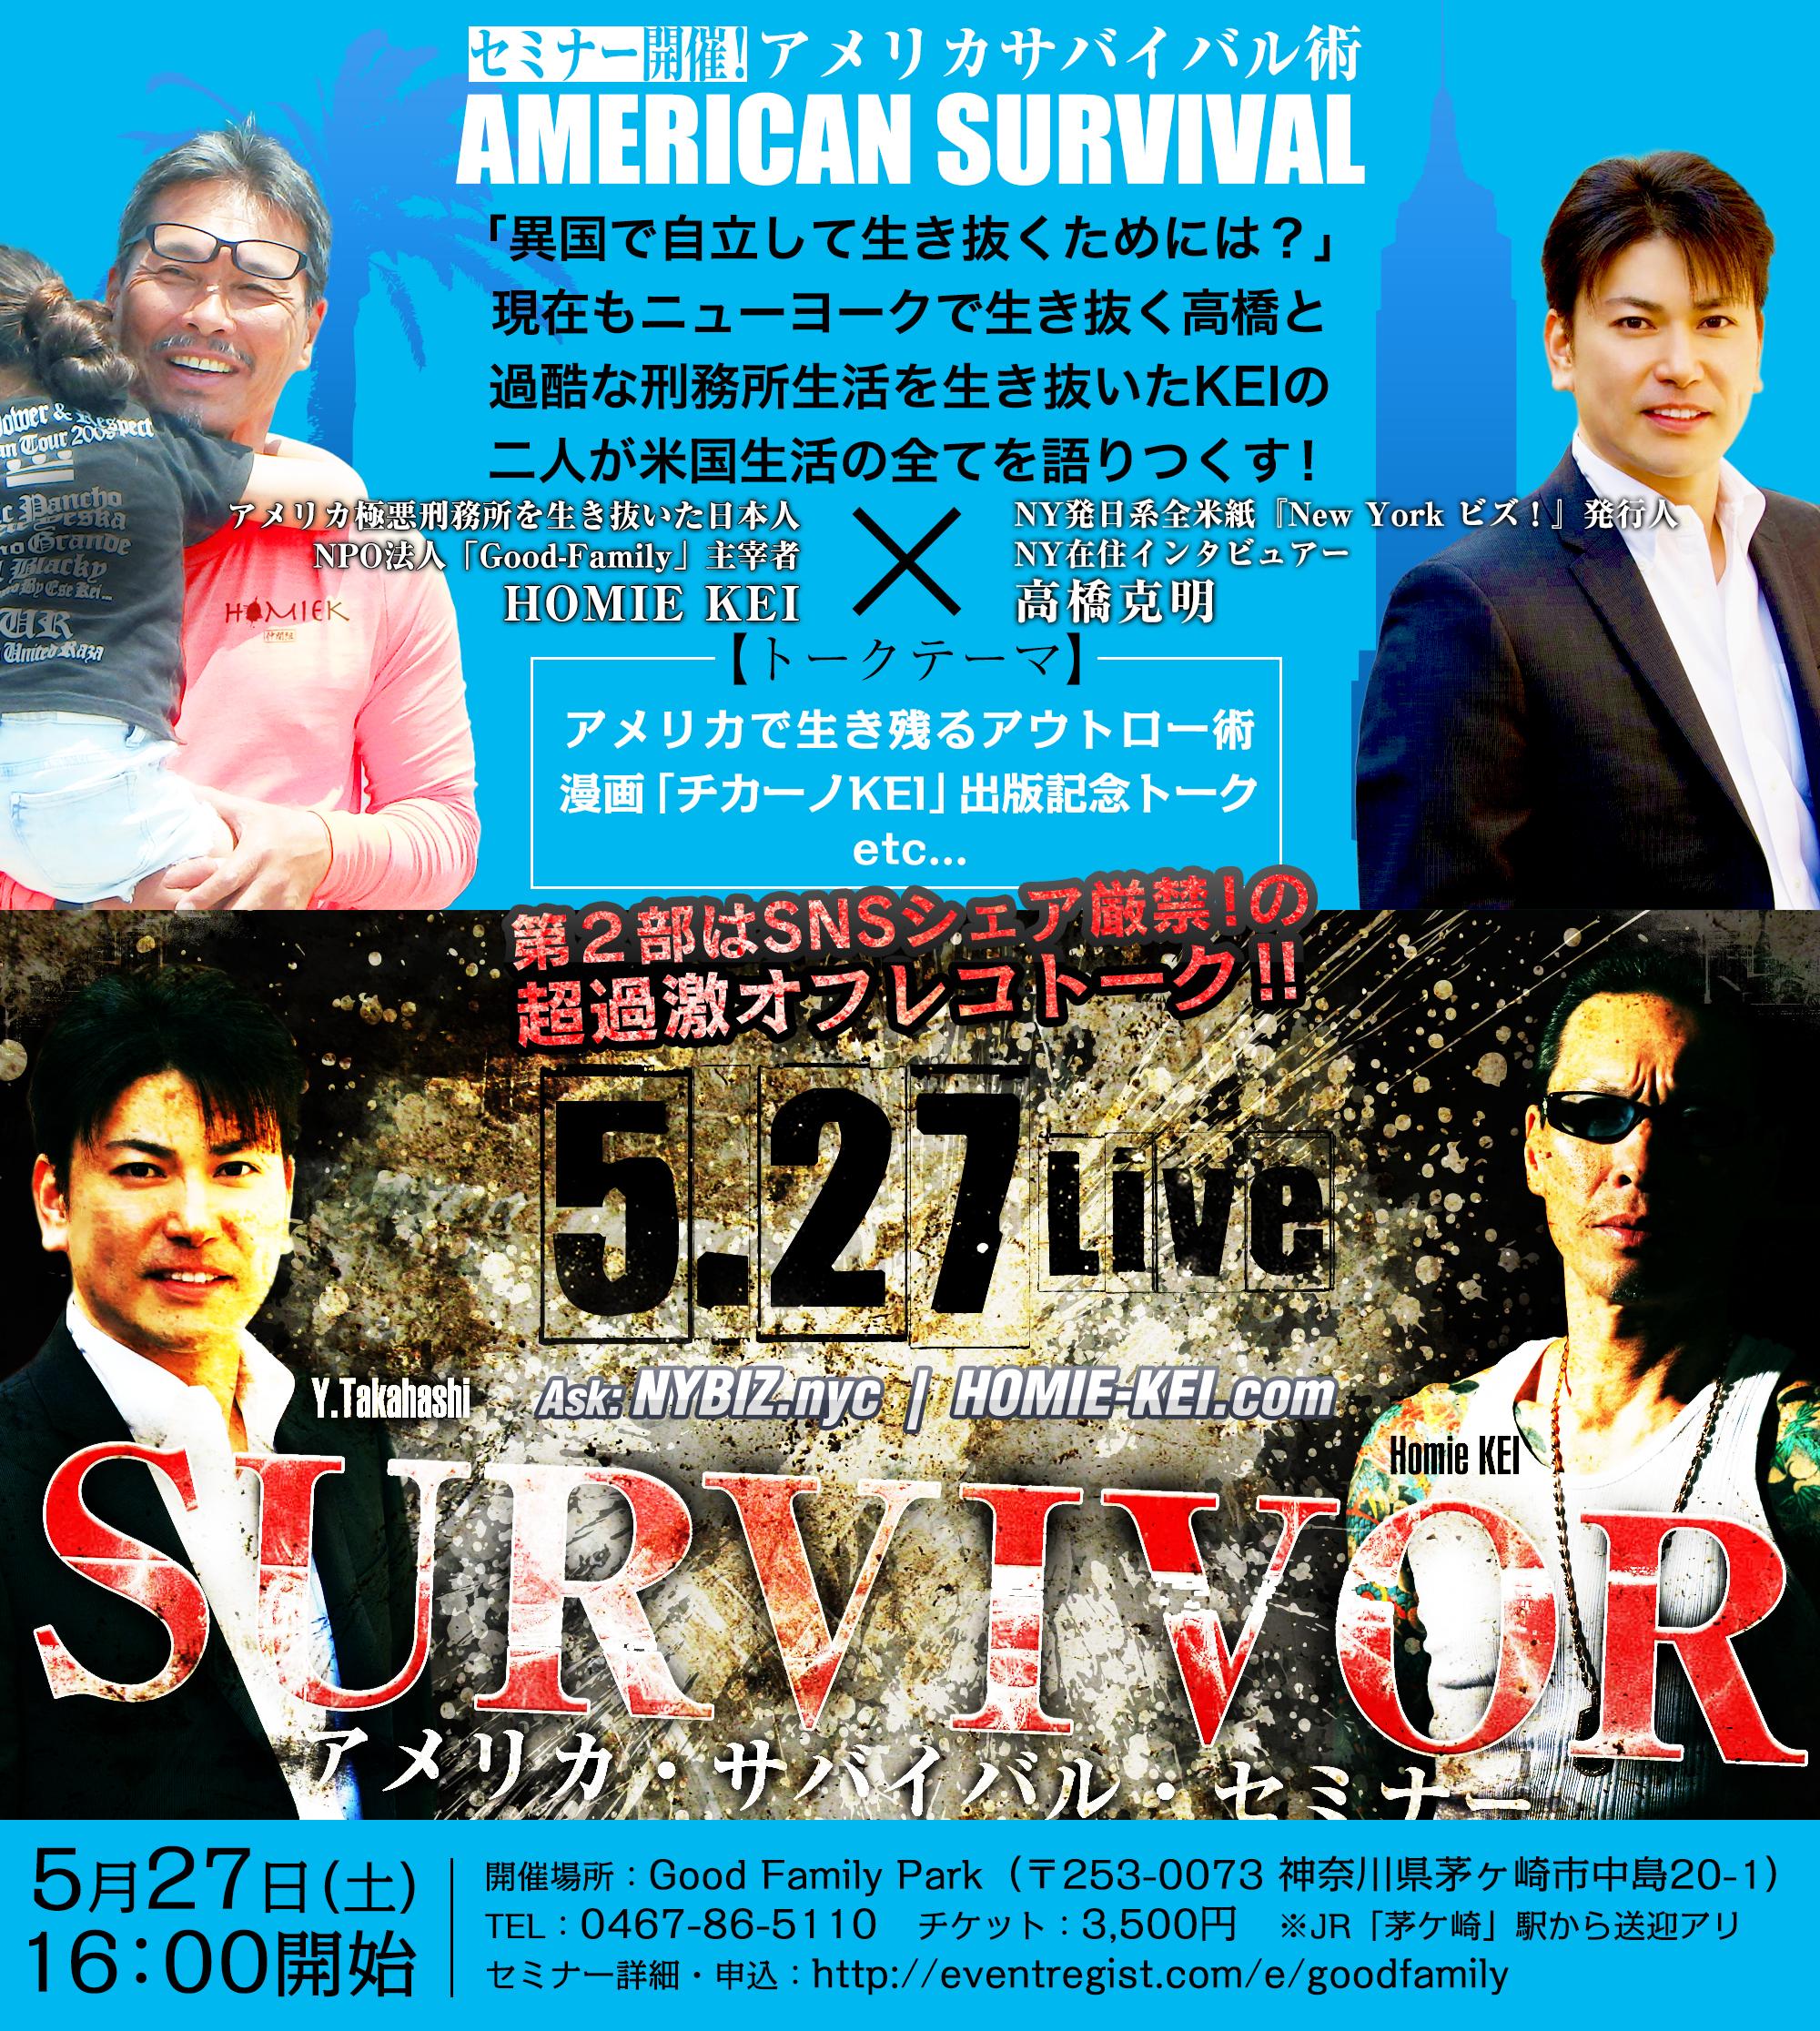 KEI×高橋克明 セミナー:アメリカサバイバル術